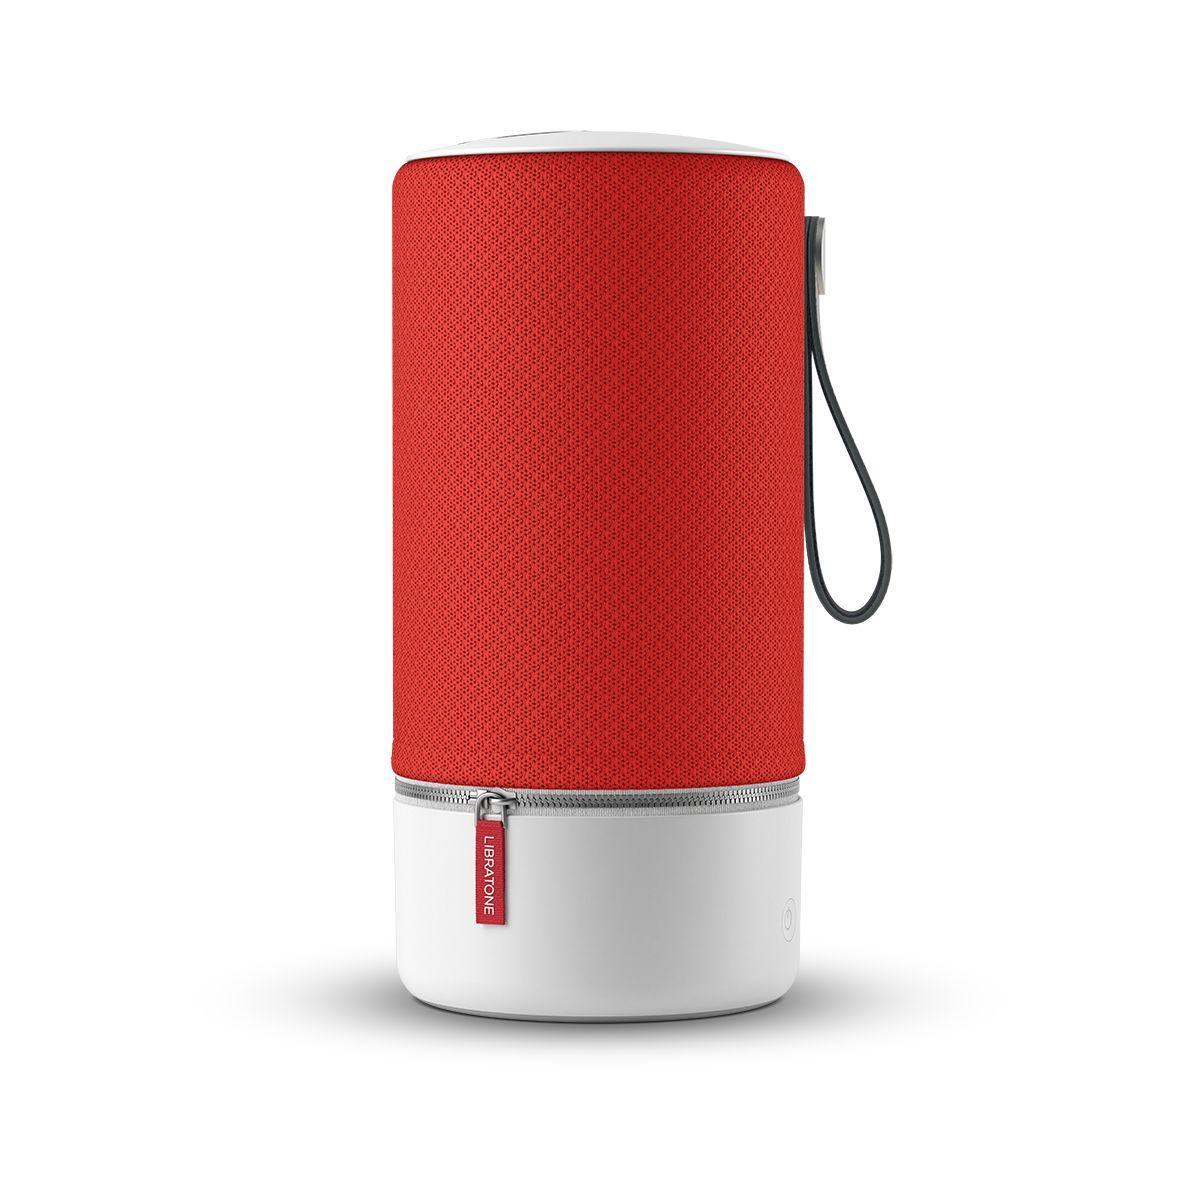 Enceinte bluetooth libratone zipp rouge - livraison offerte : code livprem